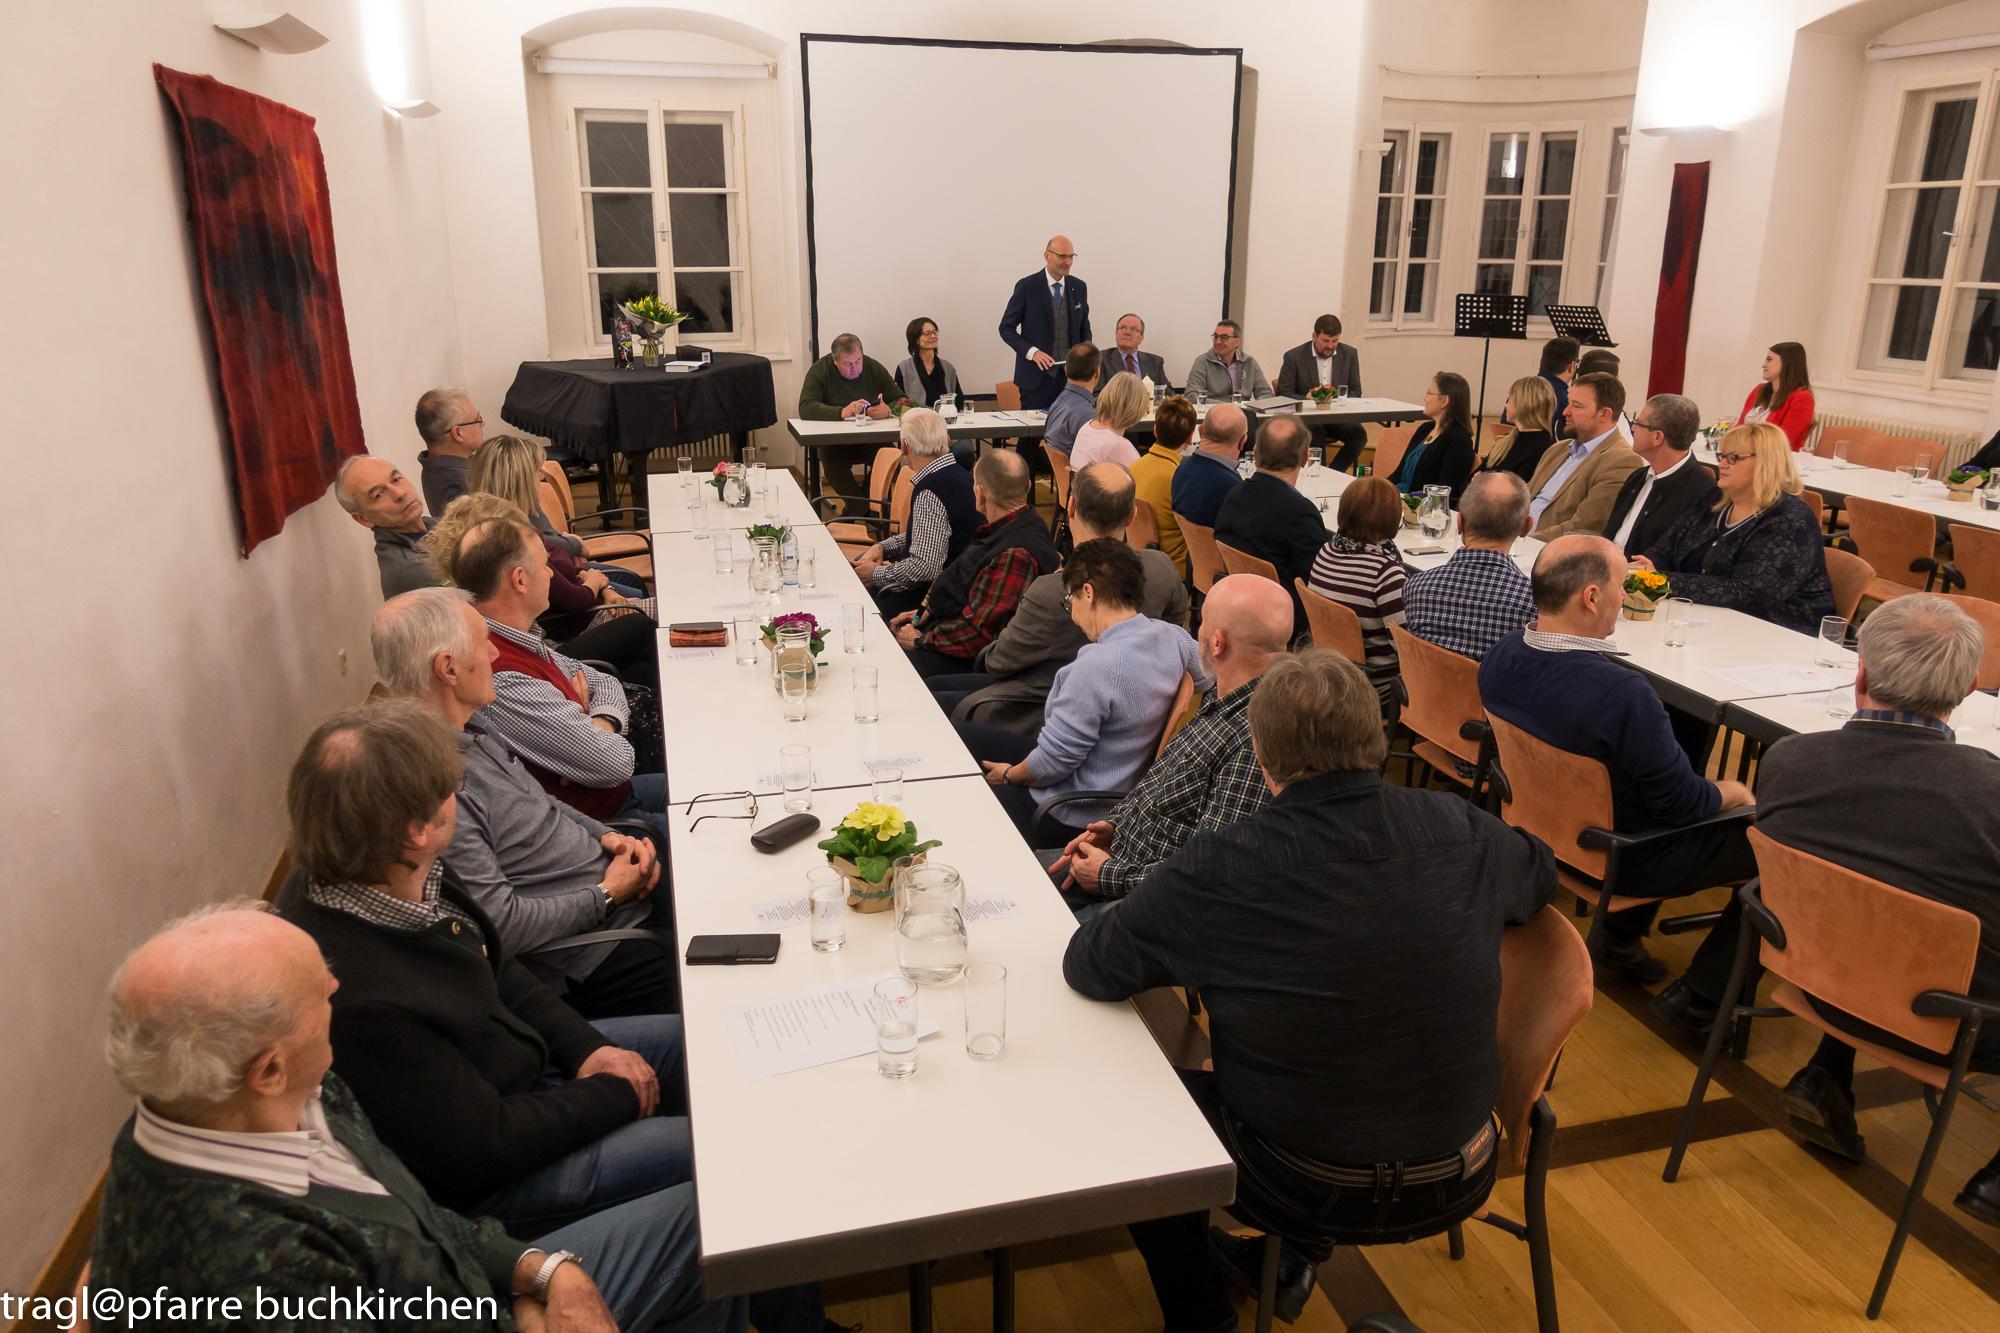 Pfarre Buchkirchen bei Wels - Dizese Linz